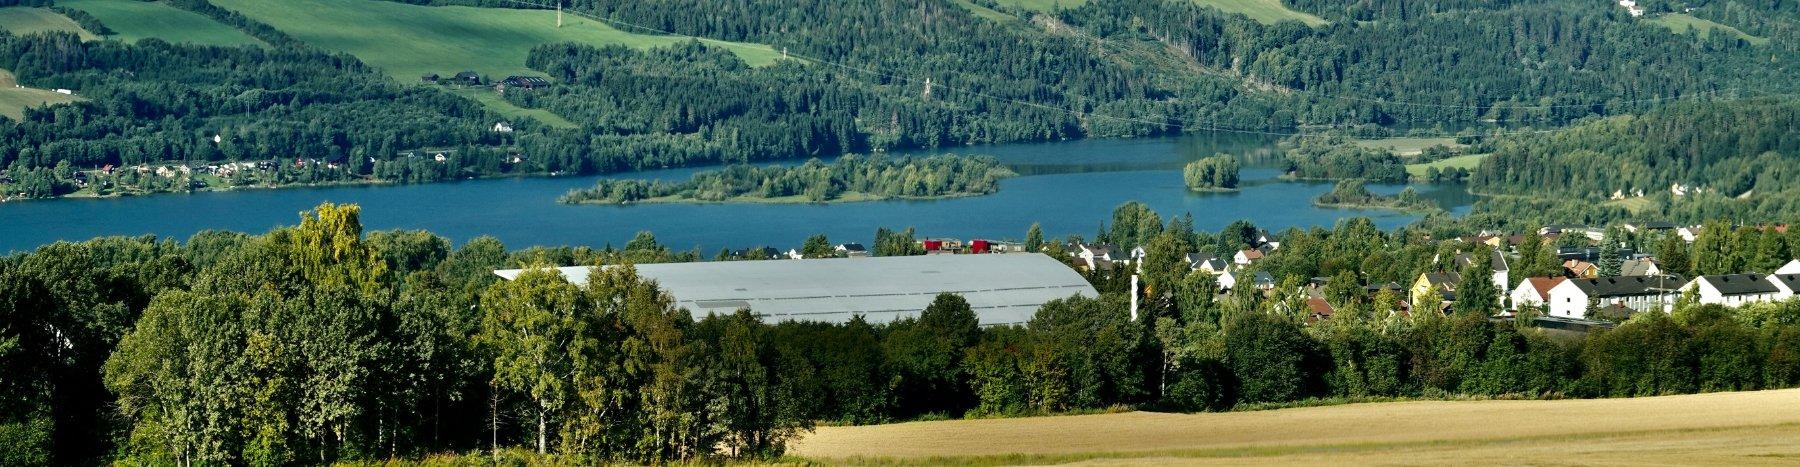 Lillehammer Panorama